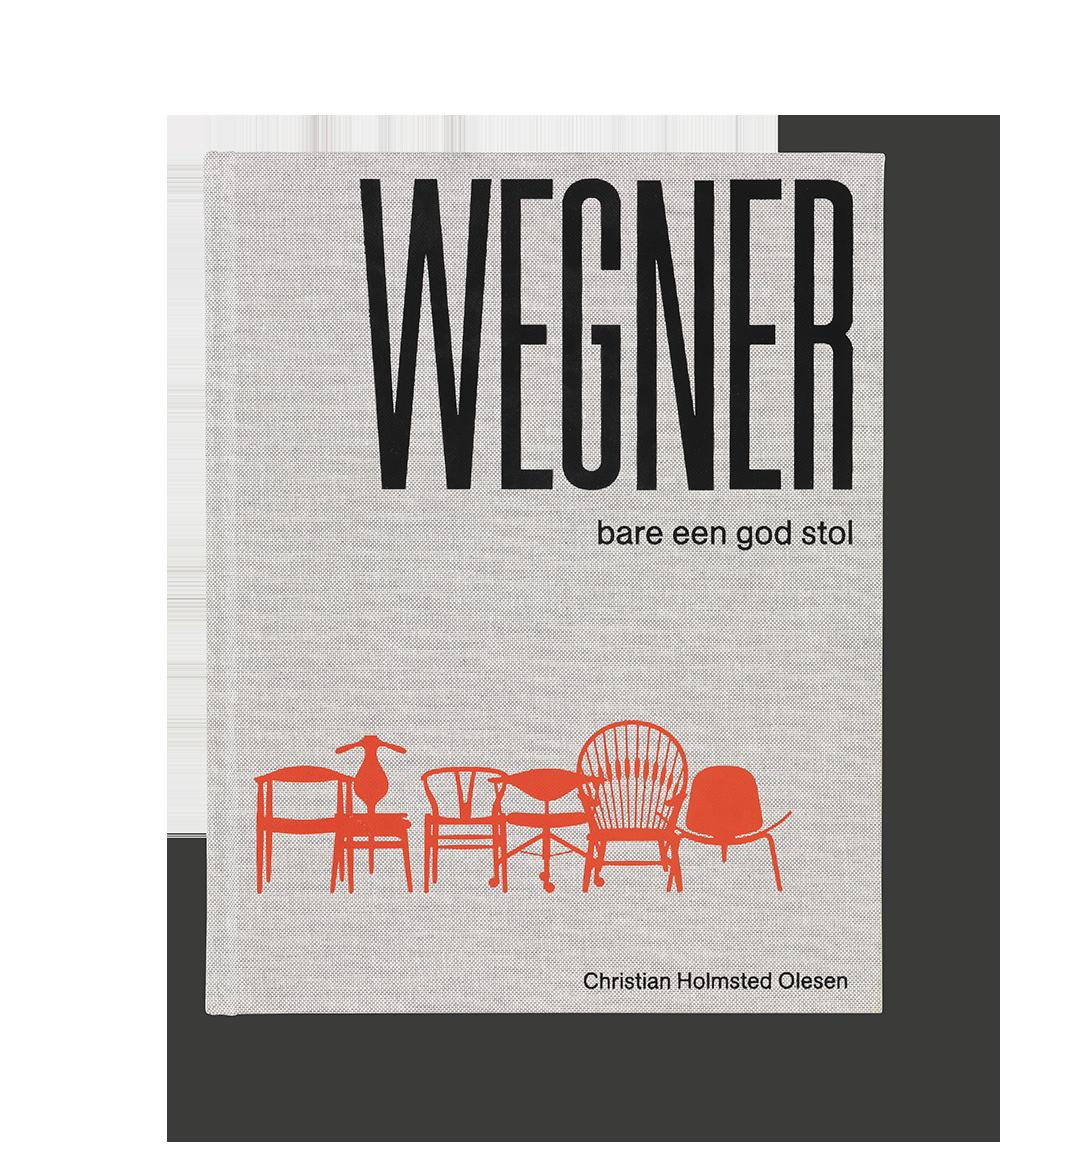 The book about Hans J. Wegner